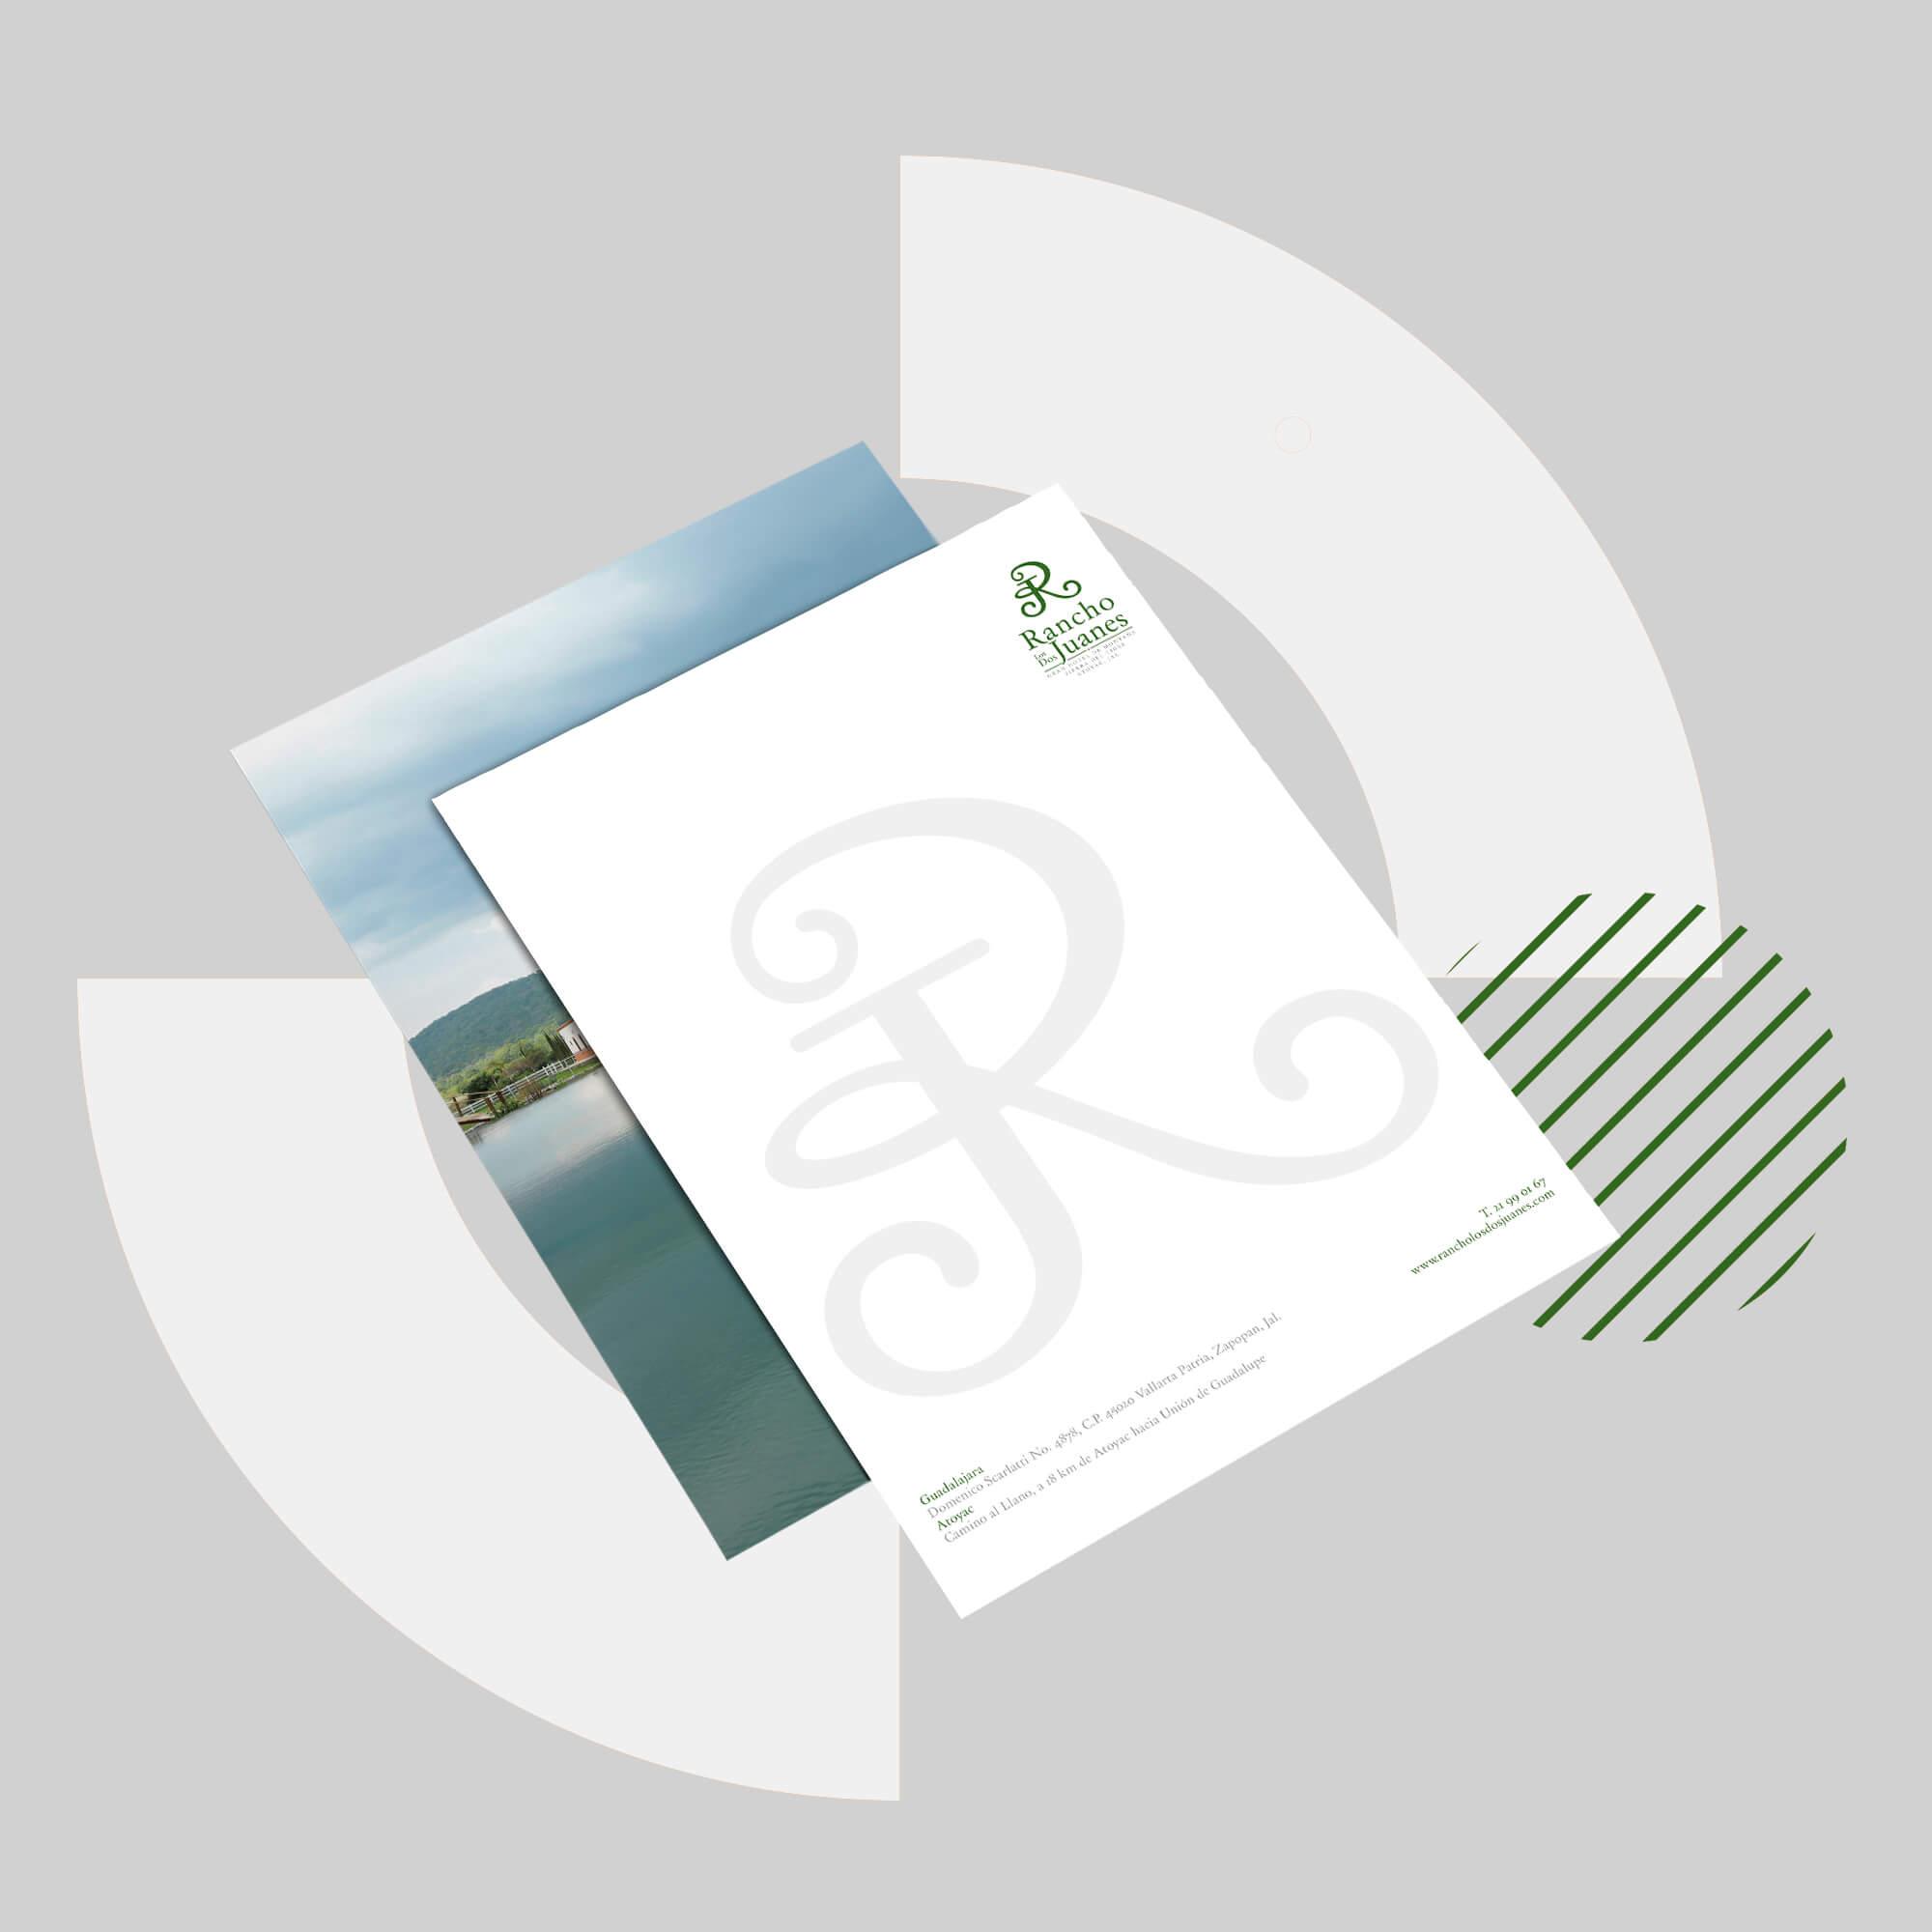 agencia-de-branding-colateral-rancho-2-juanes-branding-2